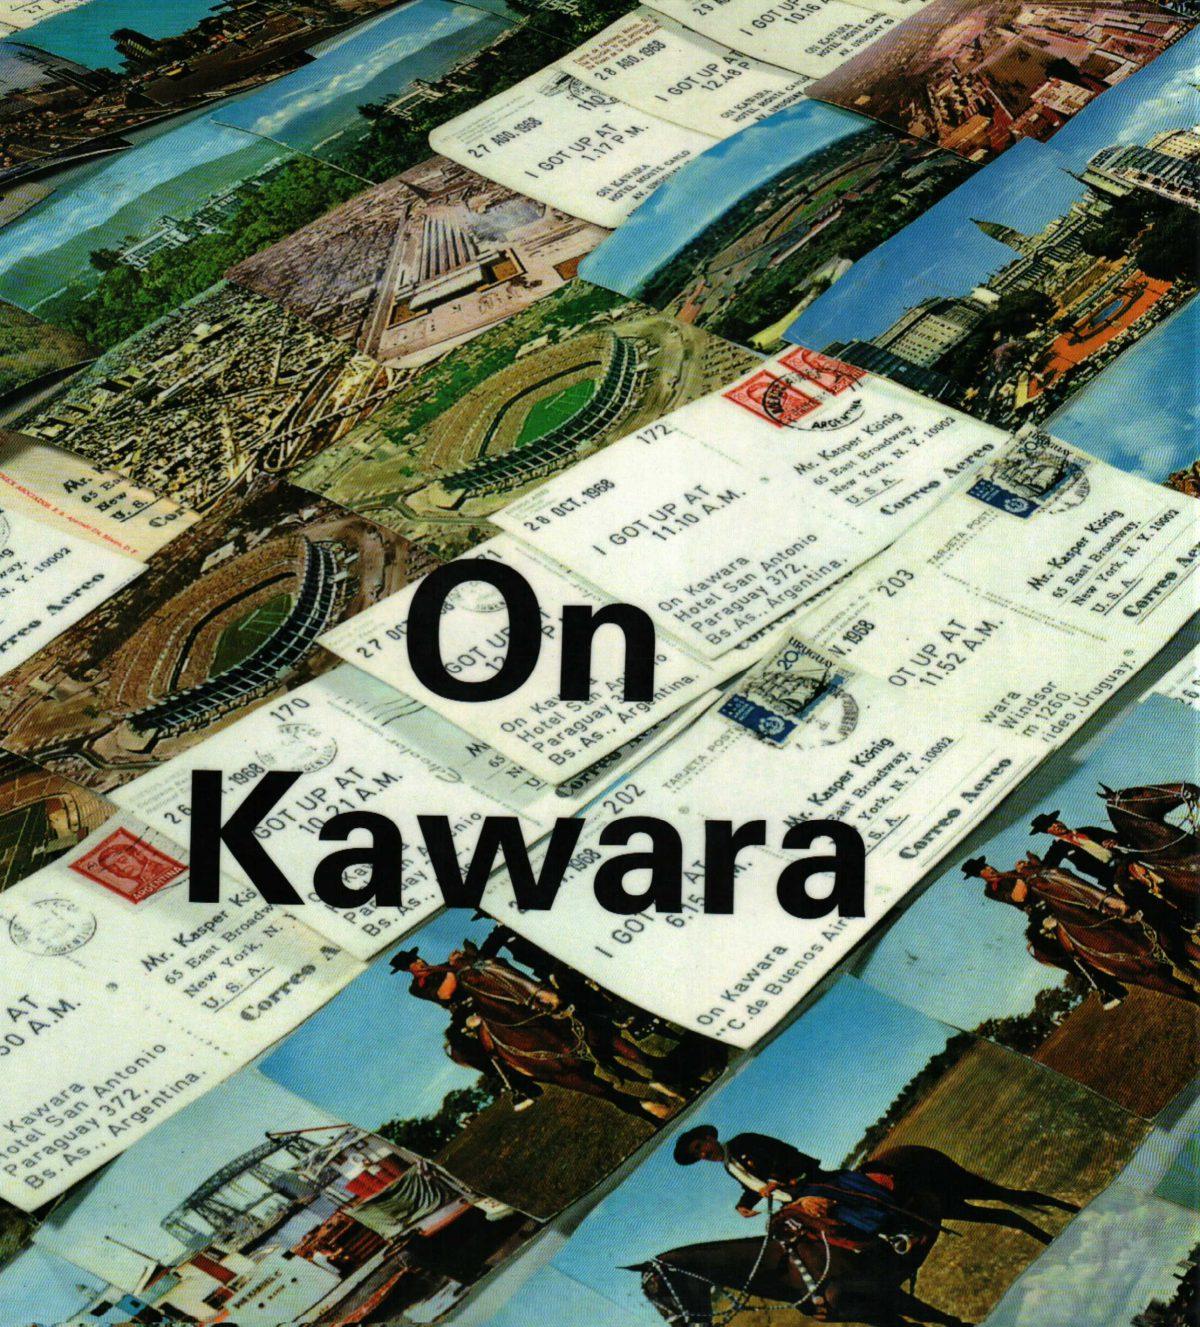 Artist Research #1 : On Kawara